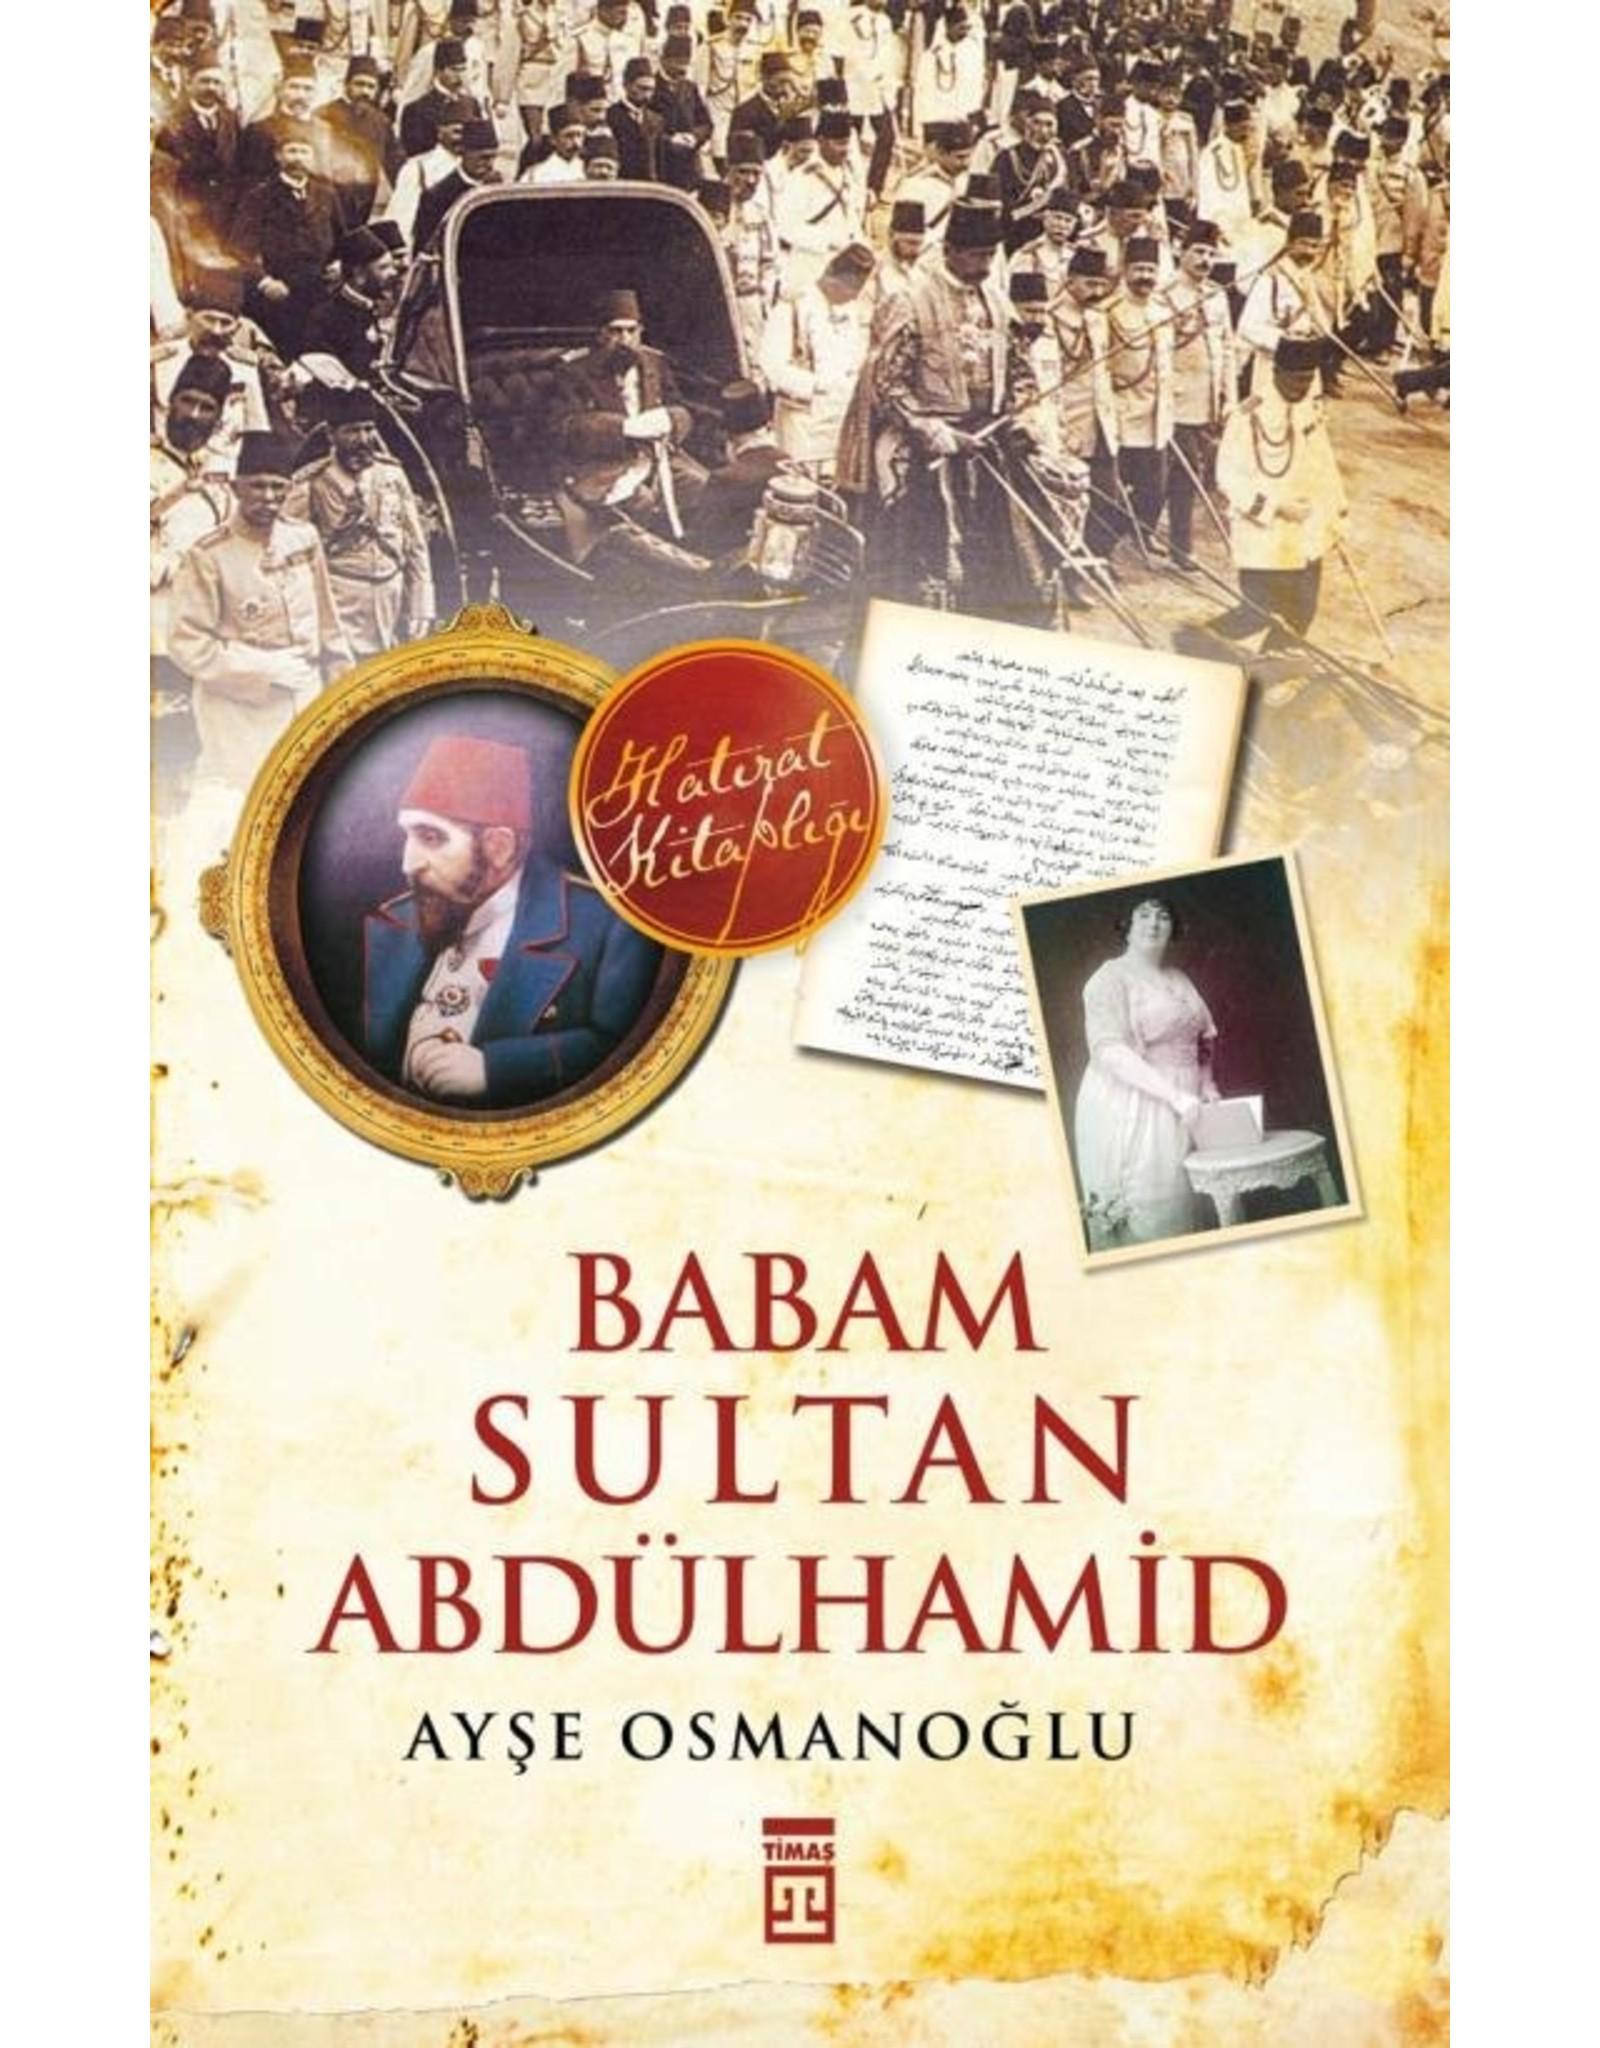 Ayşe Osmanoğlu Babam Sultan Abdülhamid